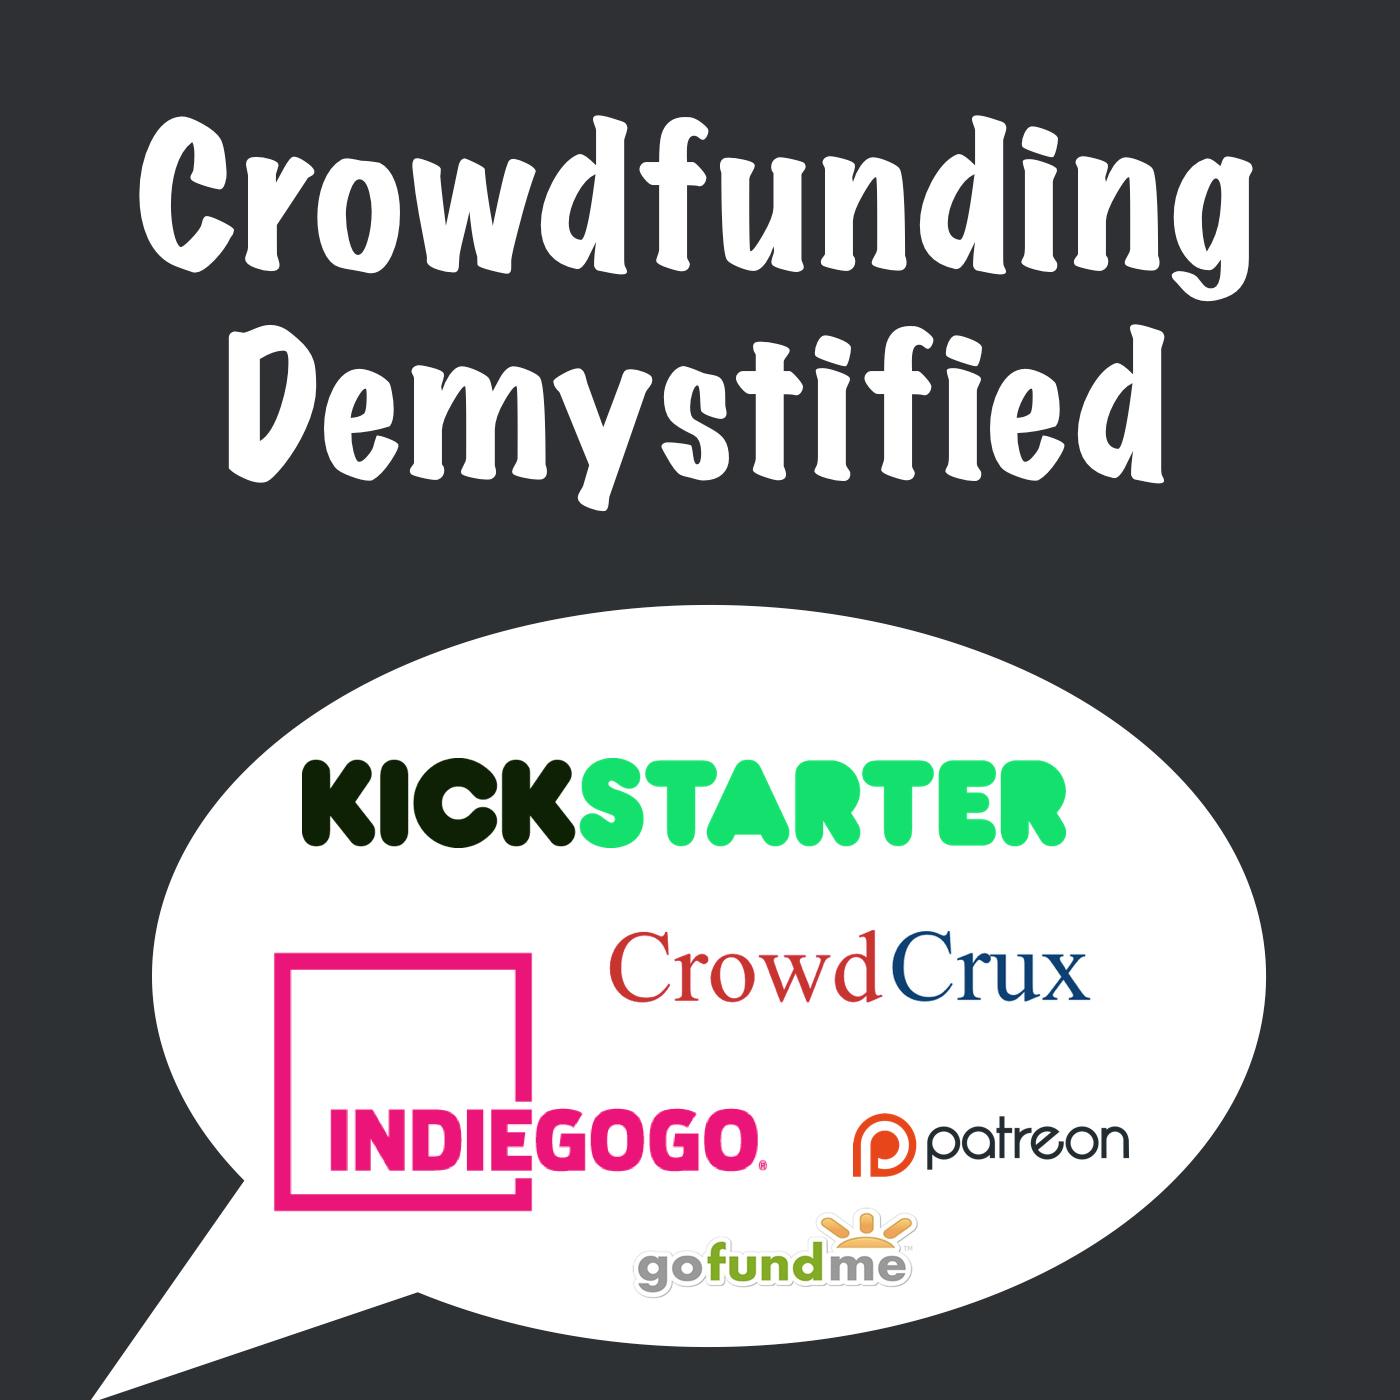 Crowdfunding: Kickstarter, Indiegogo, and Ecommerce with CrowdCrux   Crowdfunding Demystified show art